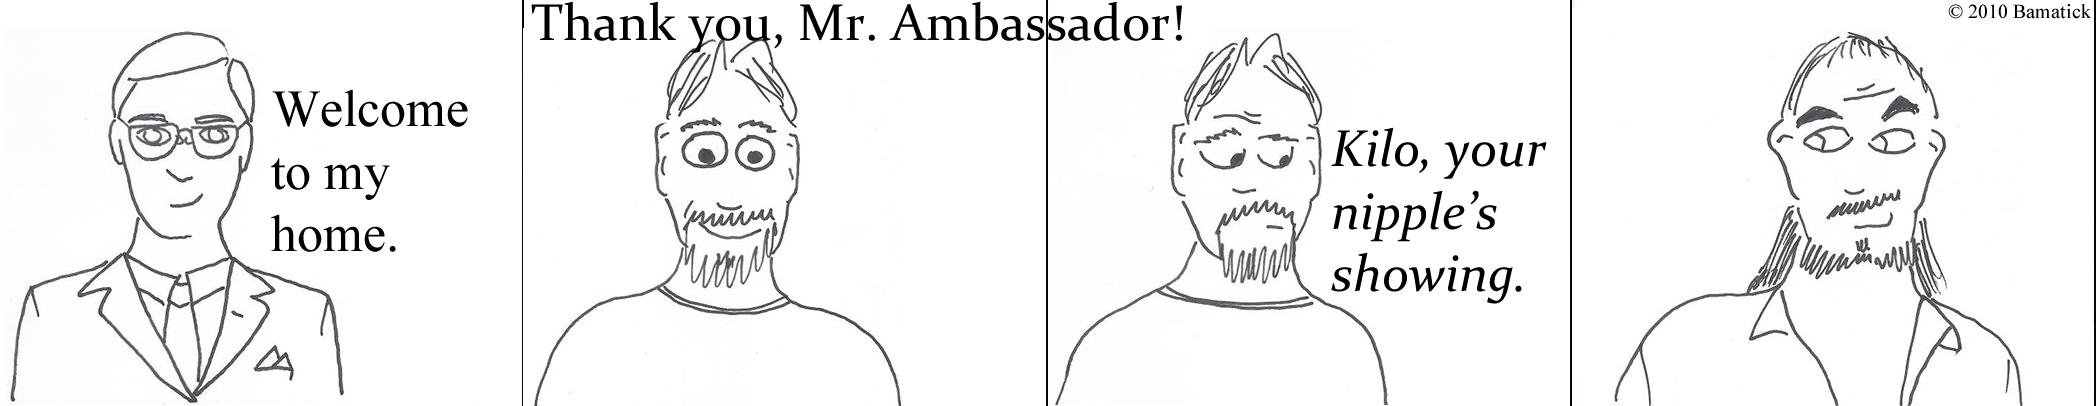 Ambassador's House